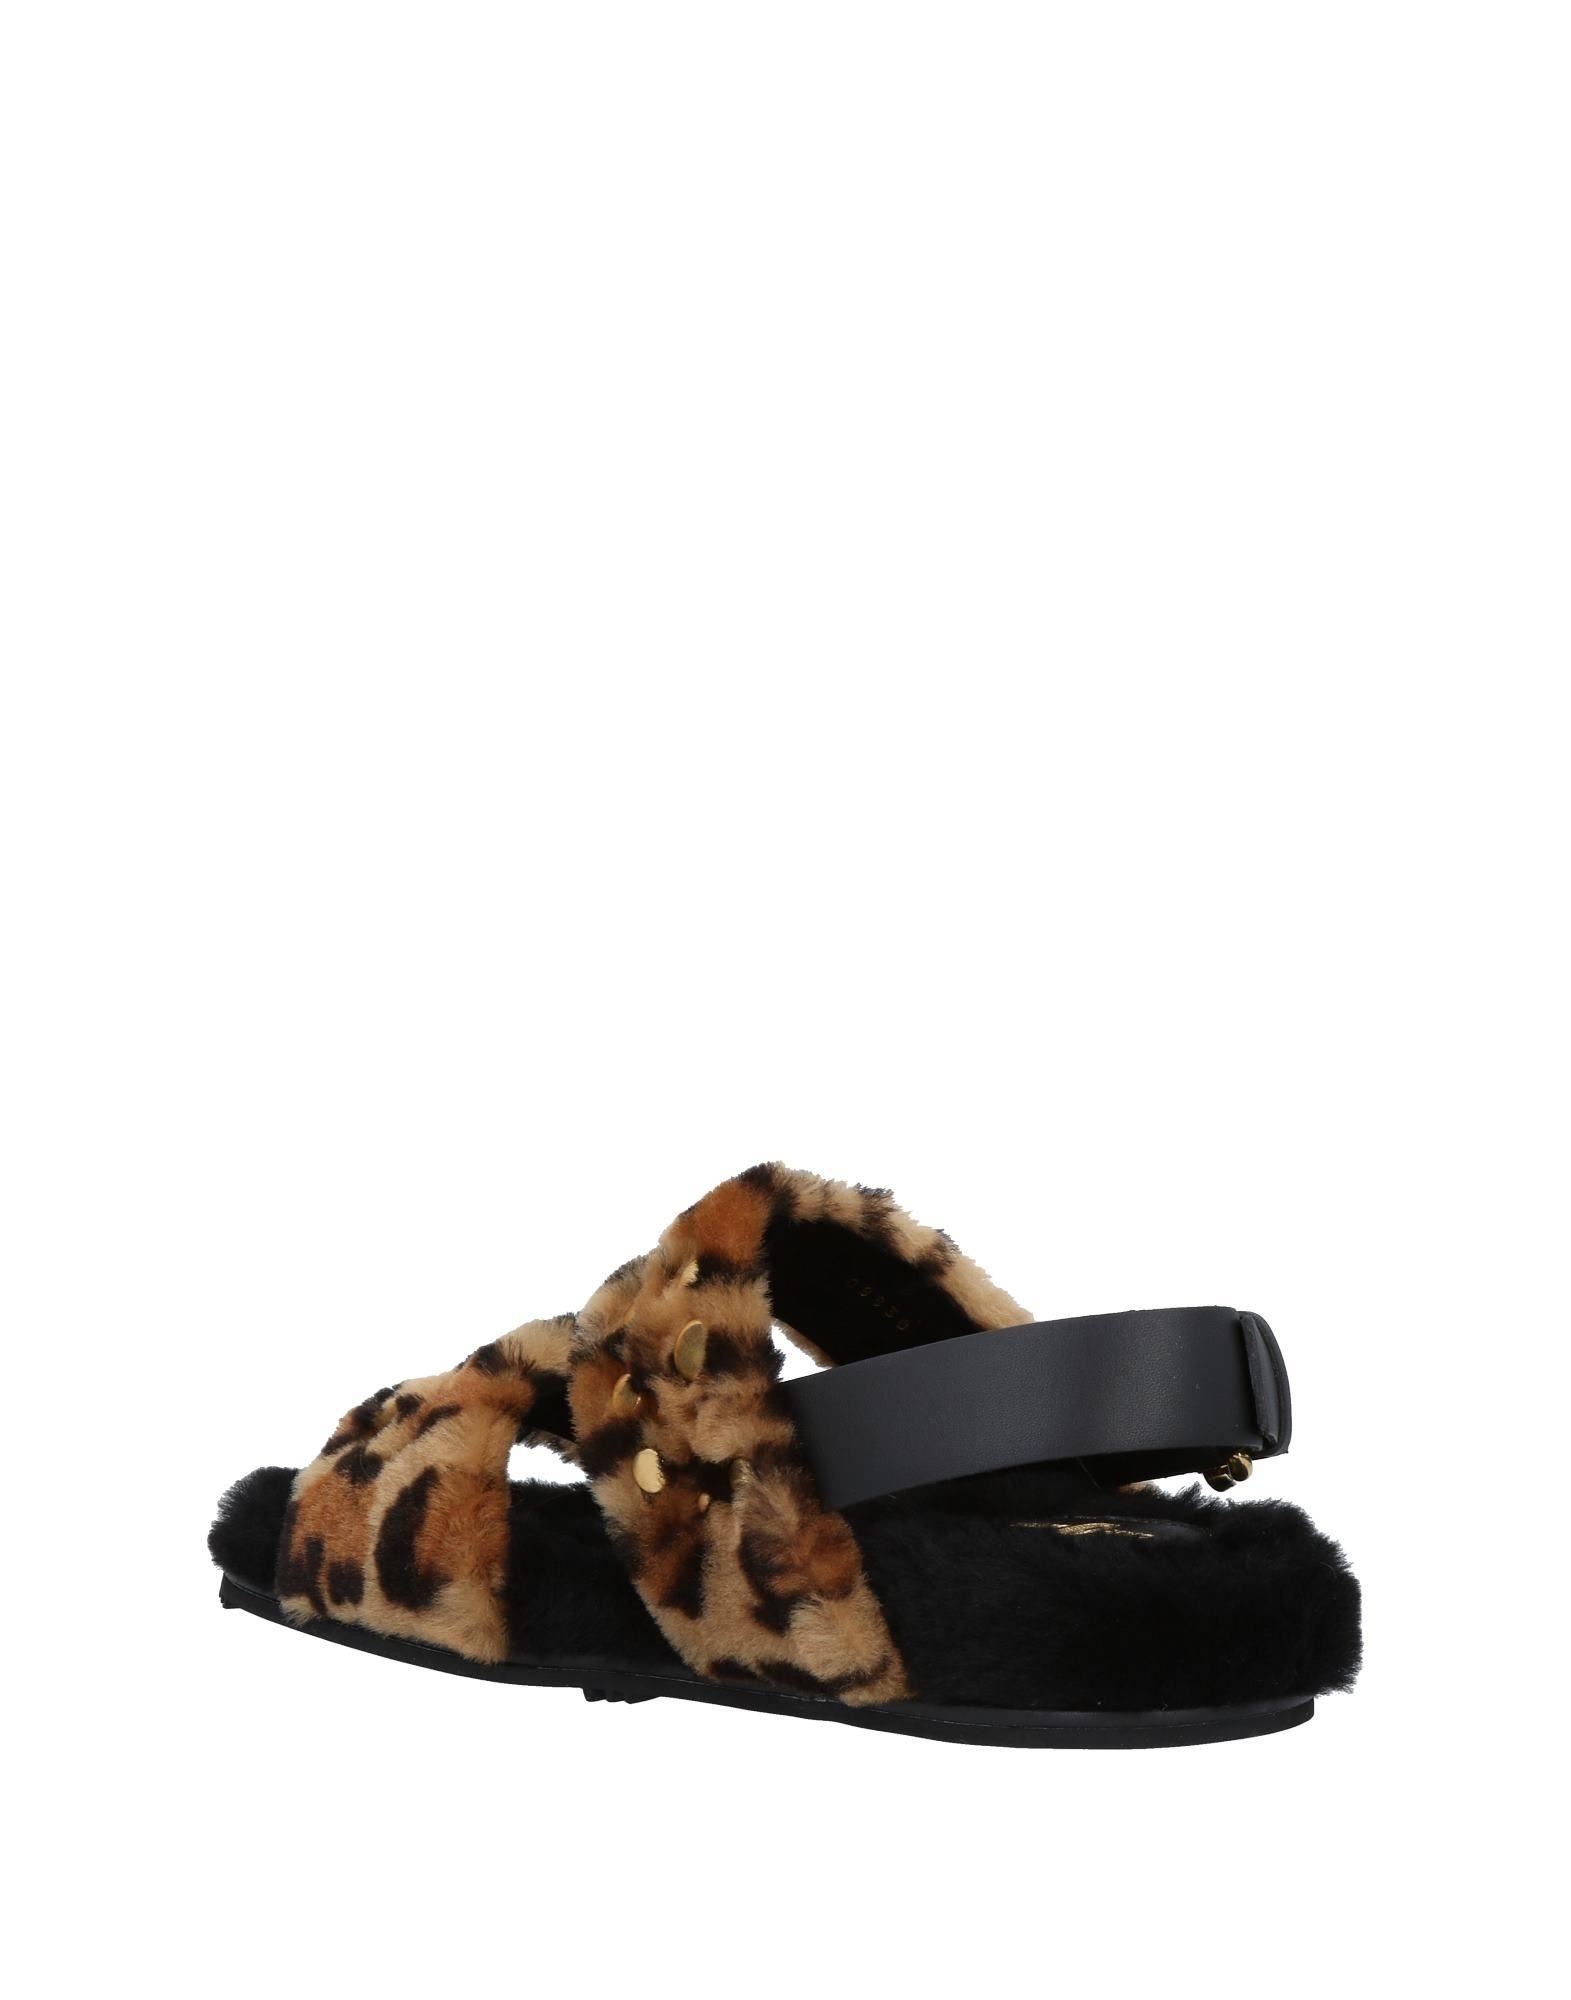 Stilvolle billige Schuhe Damen Carshoe Sandalen Damen Schuhe  11490685IM 8f6690